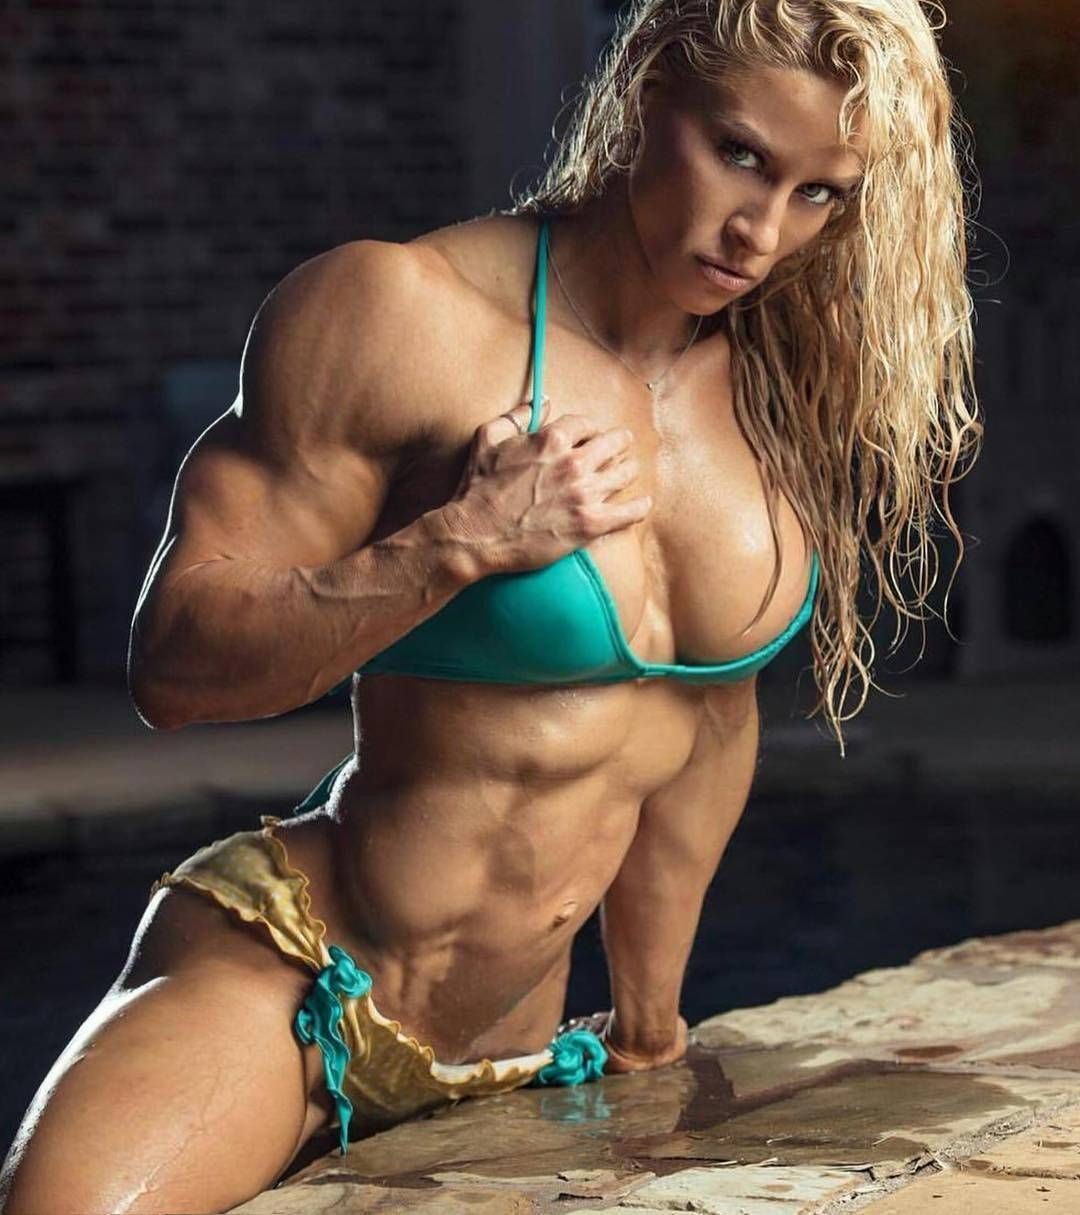 pics archives womenfitnessmodels com women fitness models pics